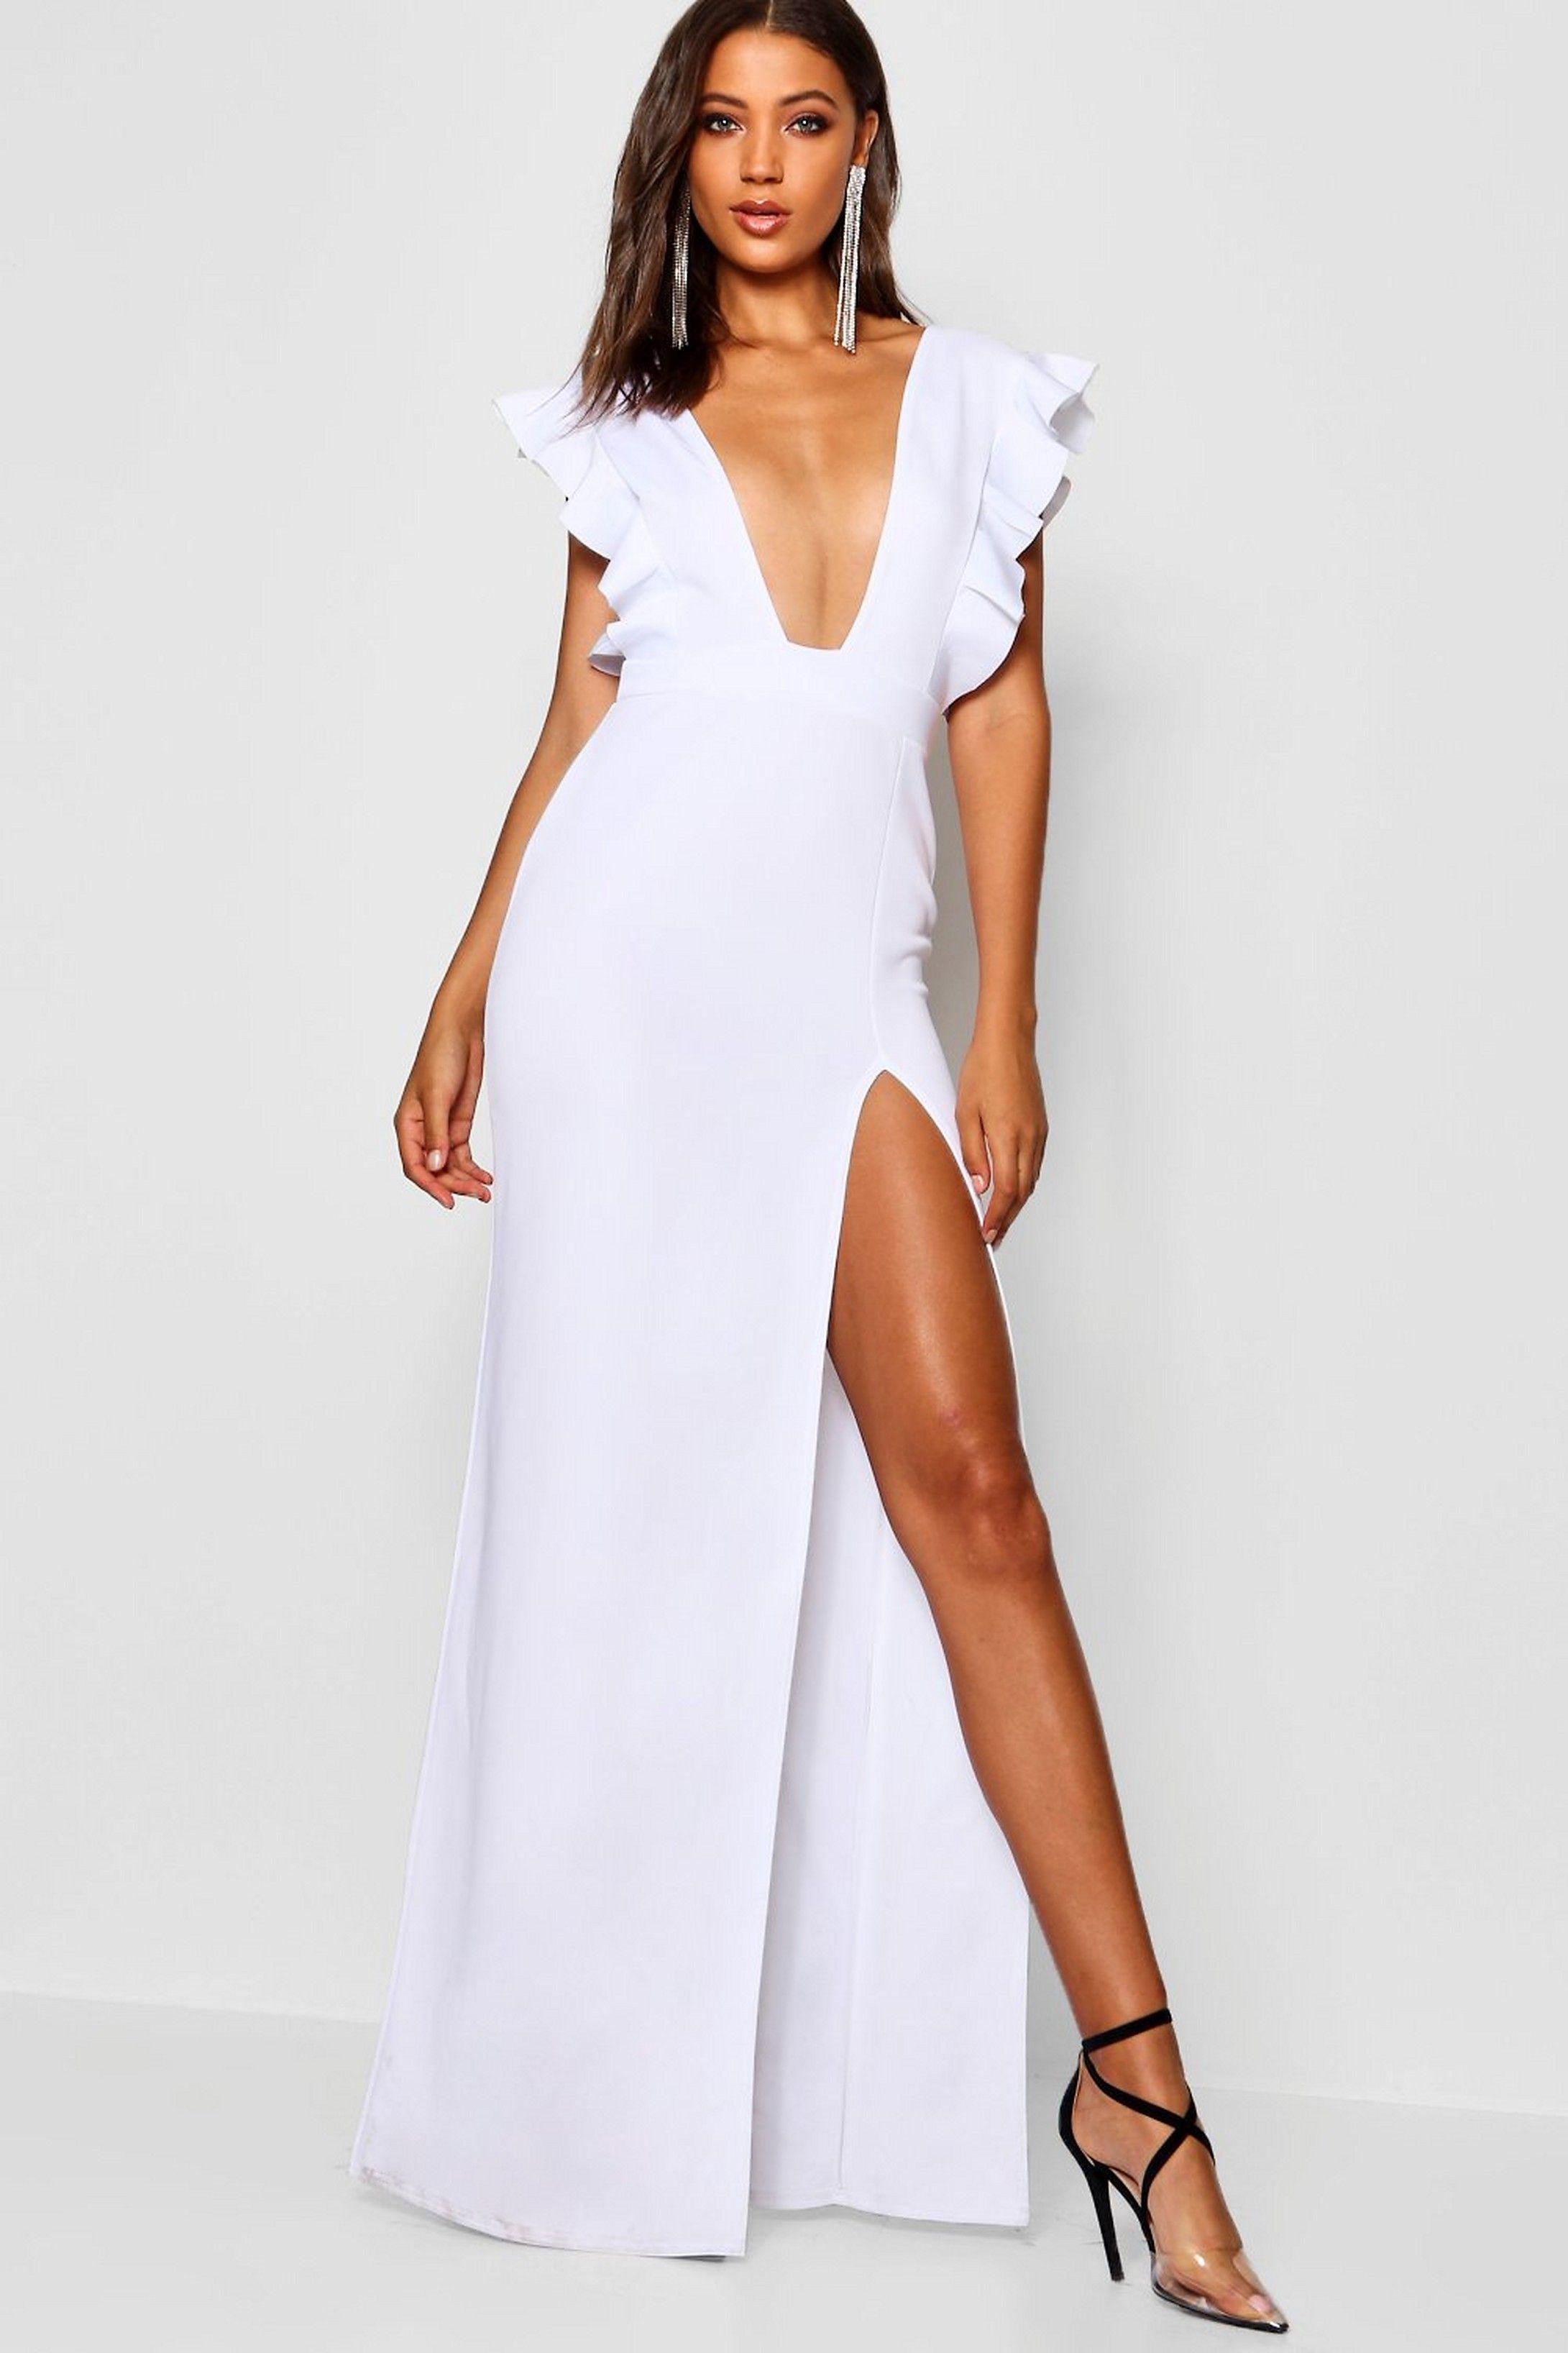 Tall Ruffle Plunge Split Leg Maxi Dress Boohoo Dresses Maxi Dress White Party Attire [ 3272 x 2181 Pixel ]